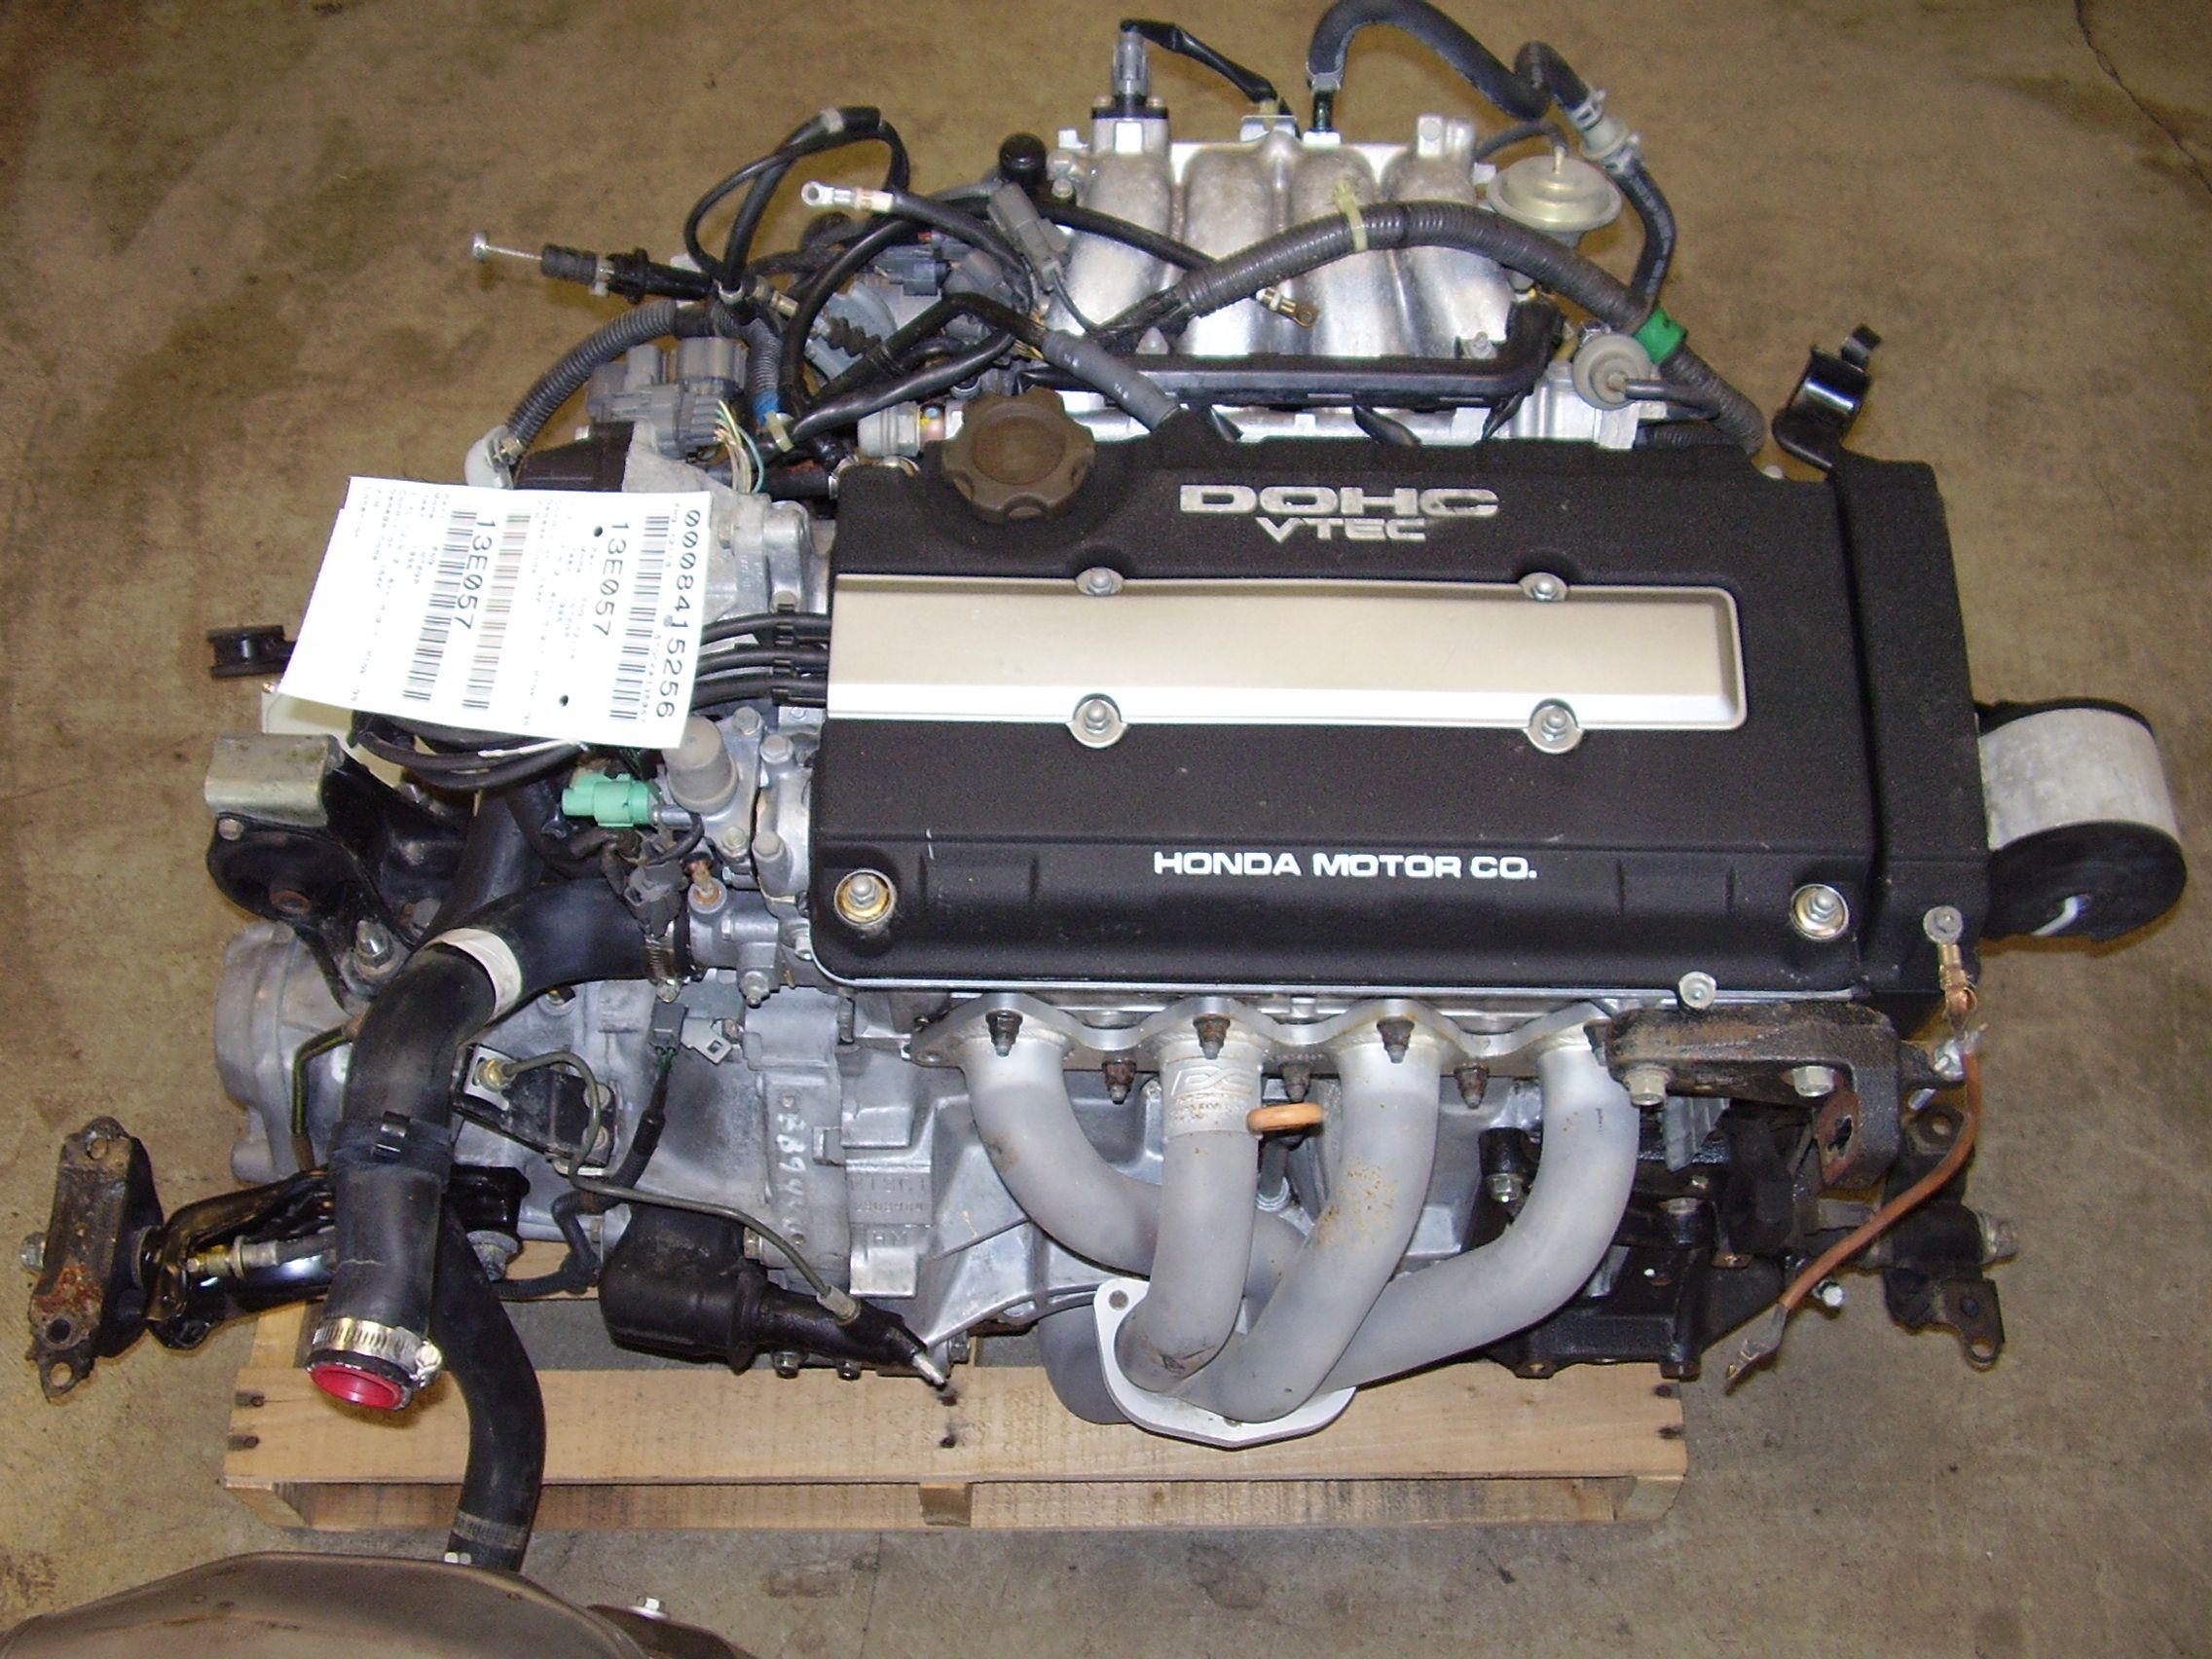 1995 acura integra gs r engine swap